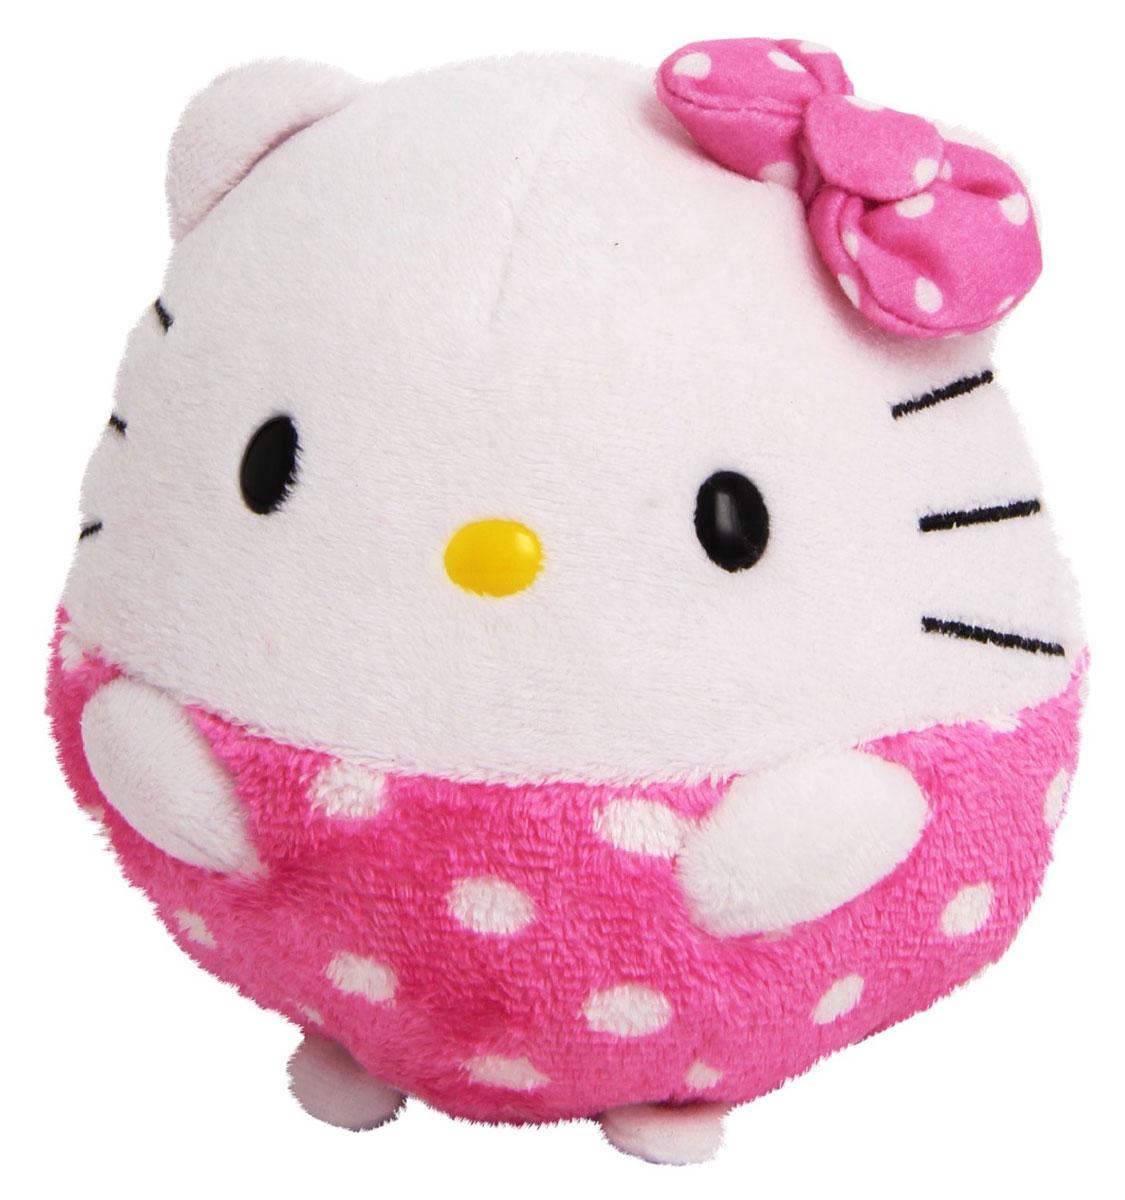 Фото TY Мягкая игрушка Hello Kitty 20 см. Купить  в РФ